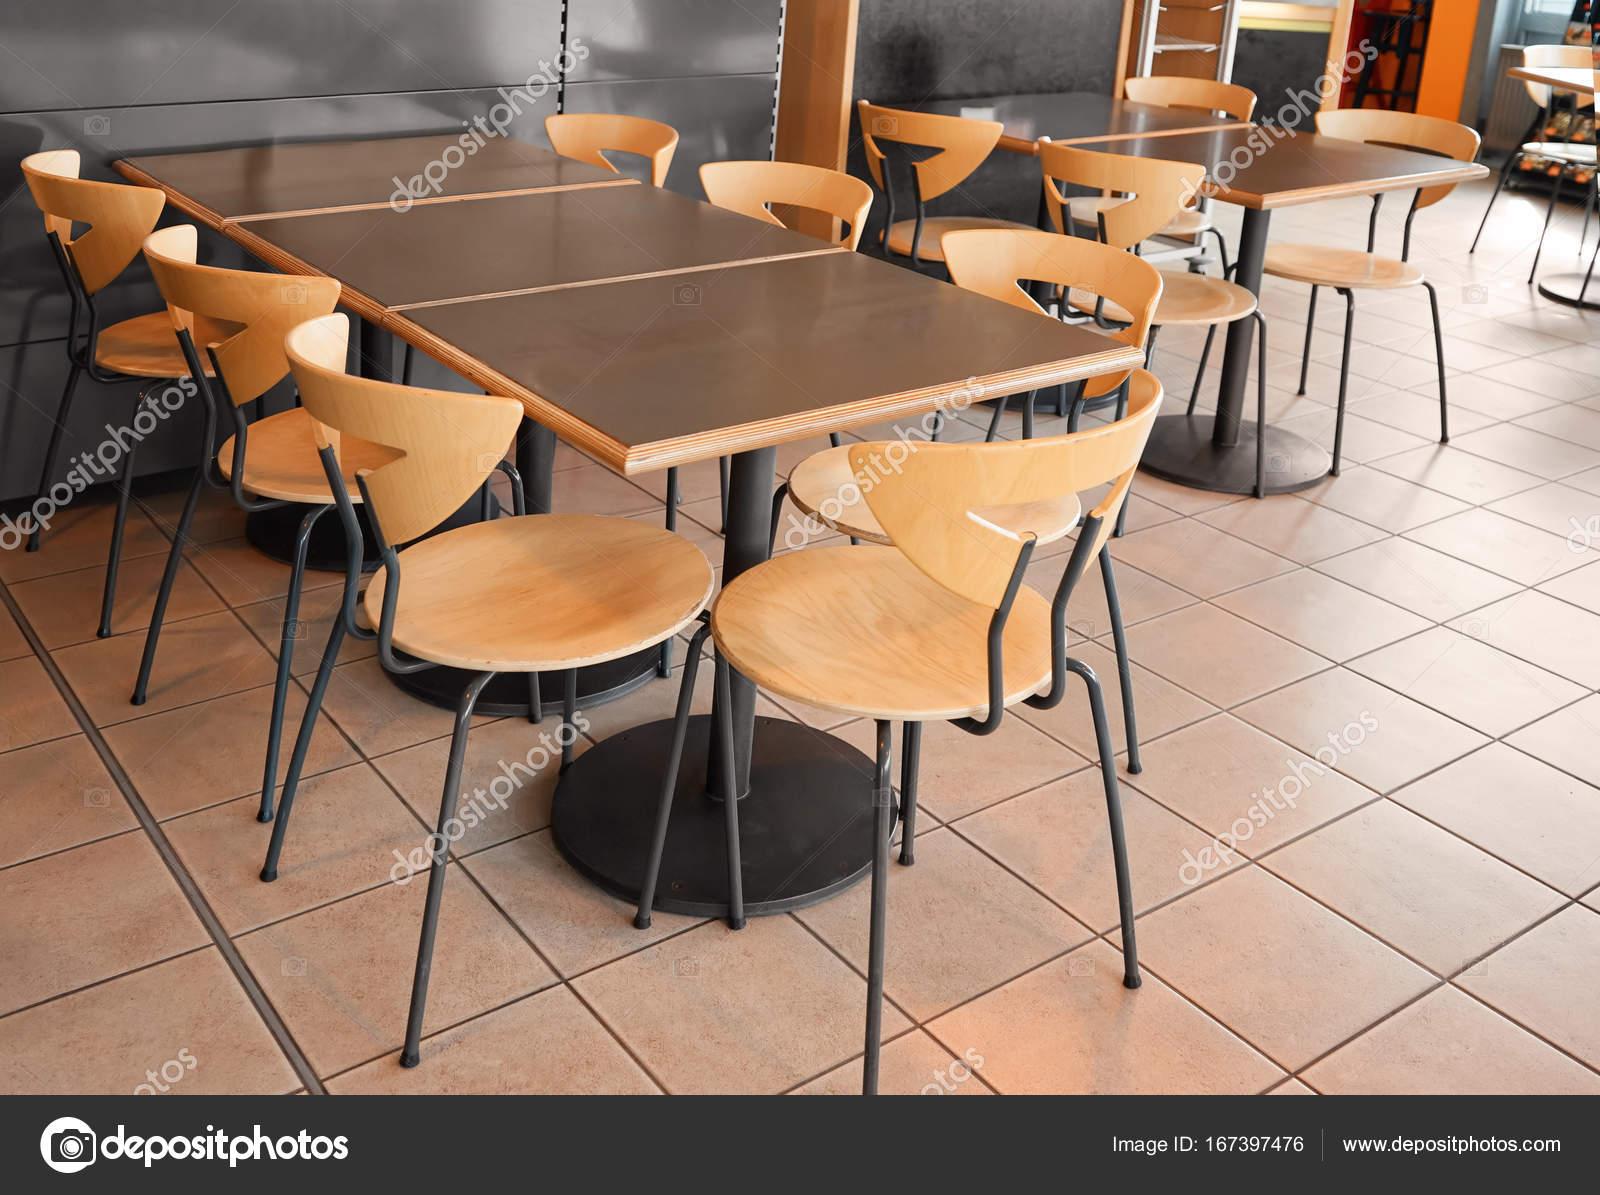 Moderne Keukentafels En Stoelen.Moderne Cafetaria Met Tafels En Stoelen Stockfoto C Belchonock